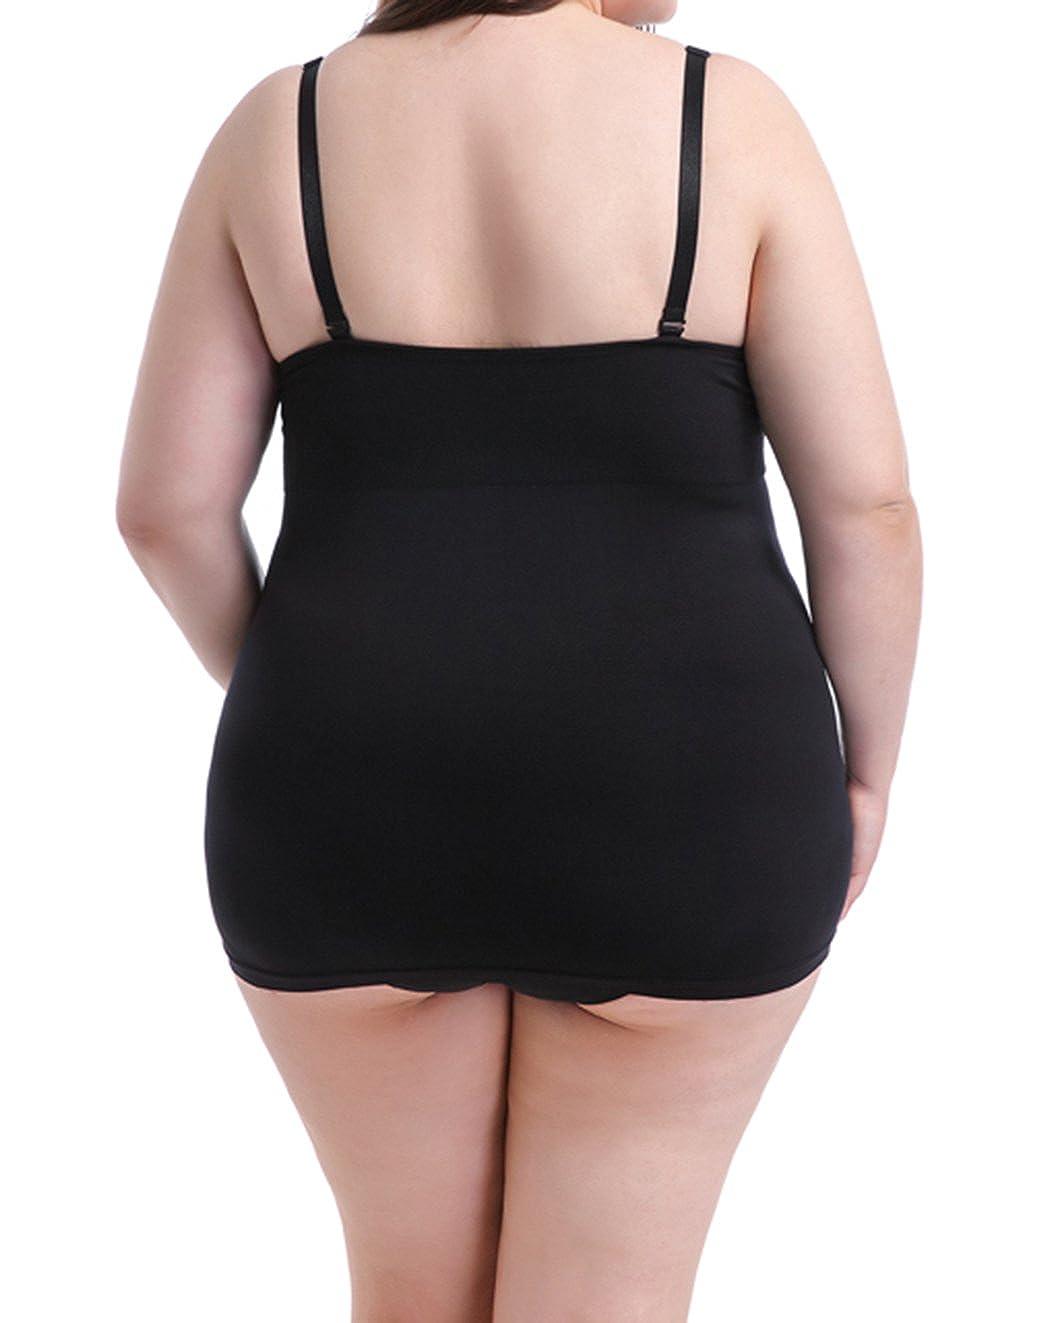 decd964a60d Orilife Women Nursing Tank Top Sleep Bra for Breastfeeding Plus Size XXXXL  Orilife-0531-Black-XXXXL Maternity